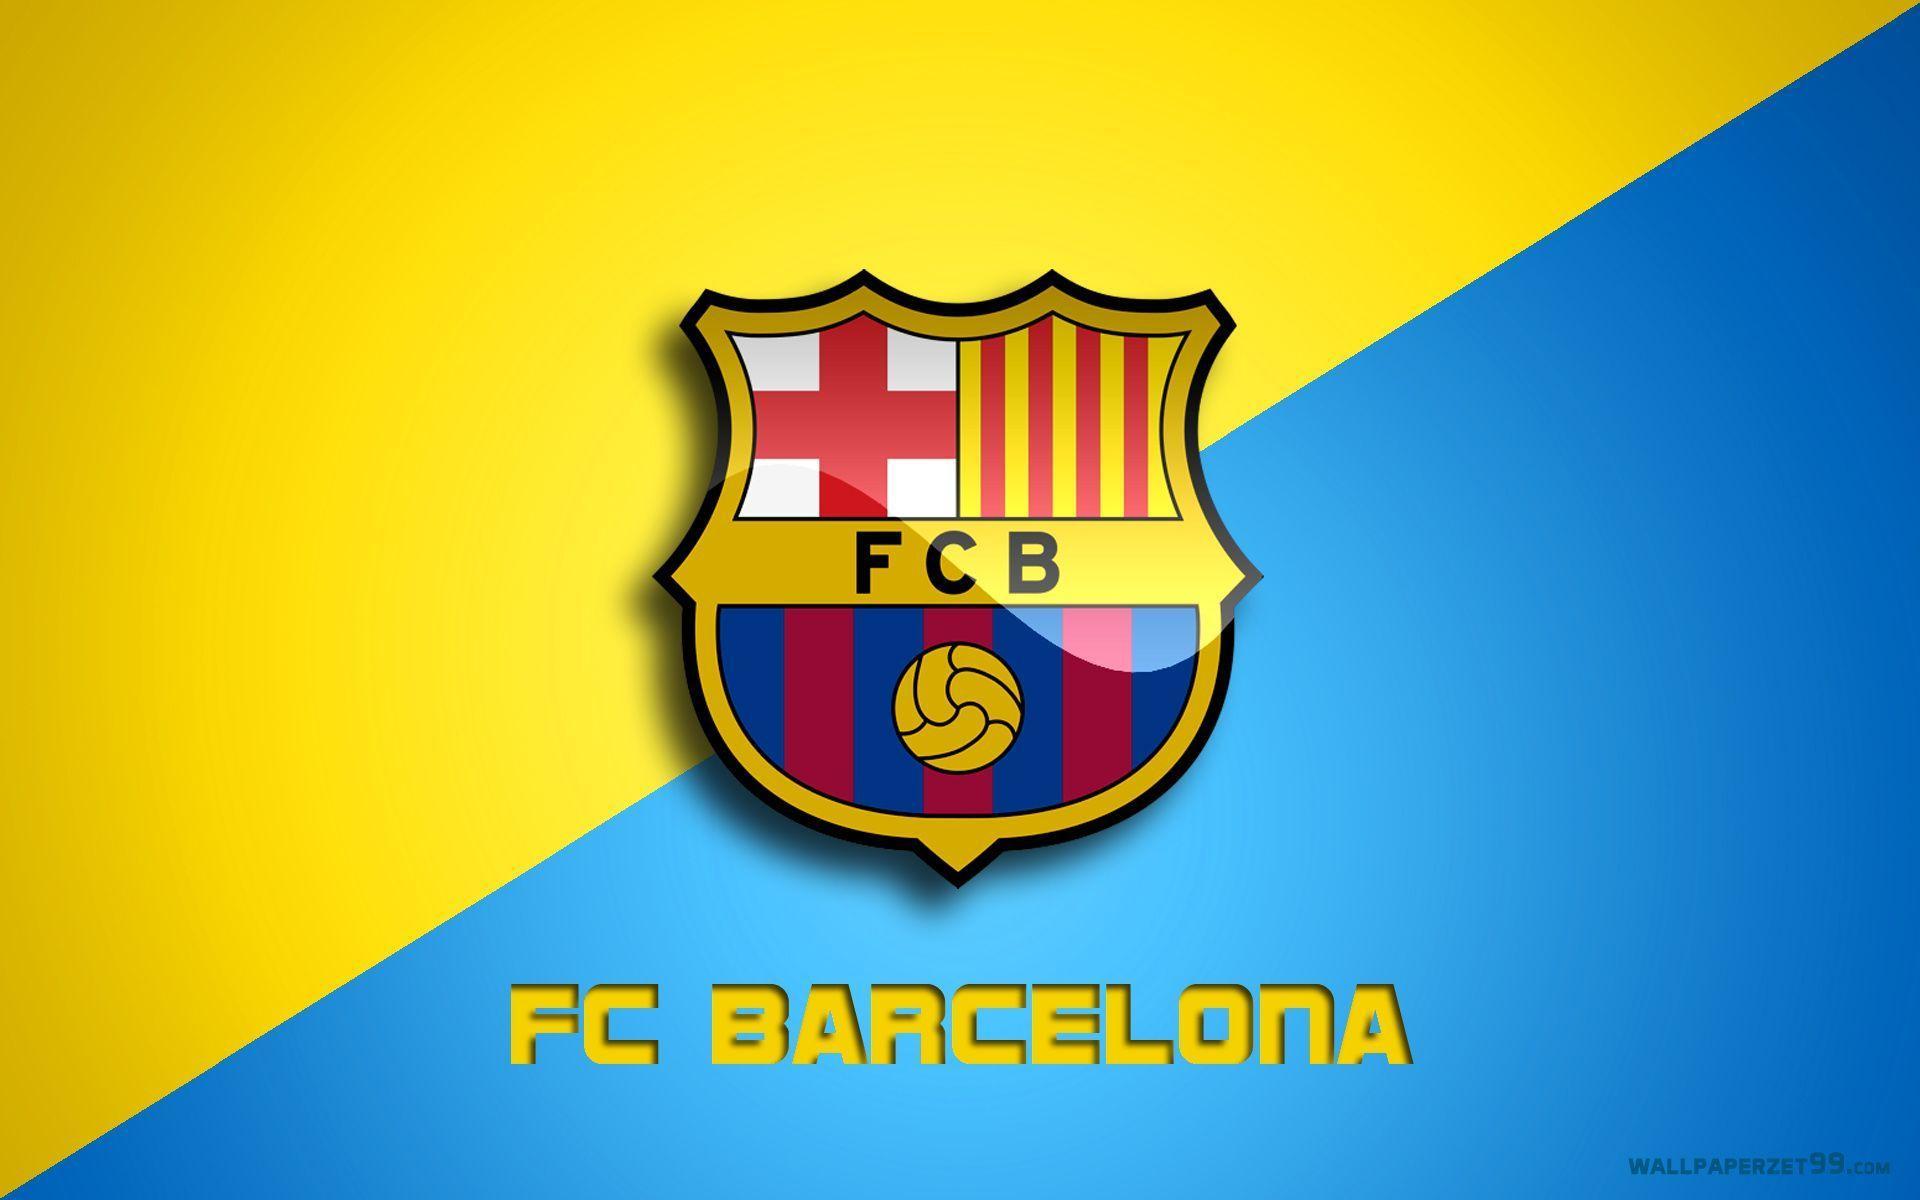 Barcelona logo 2017 wallpapers wallpaper cave barcelona logo 2016 wallpapers wallpaper cave voltagebd Choice Image